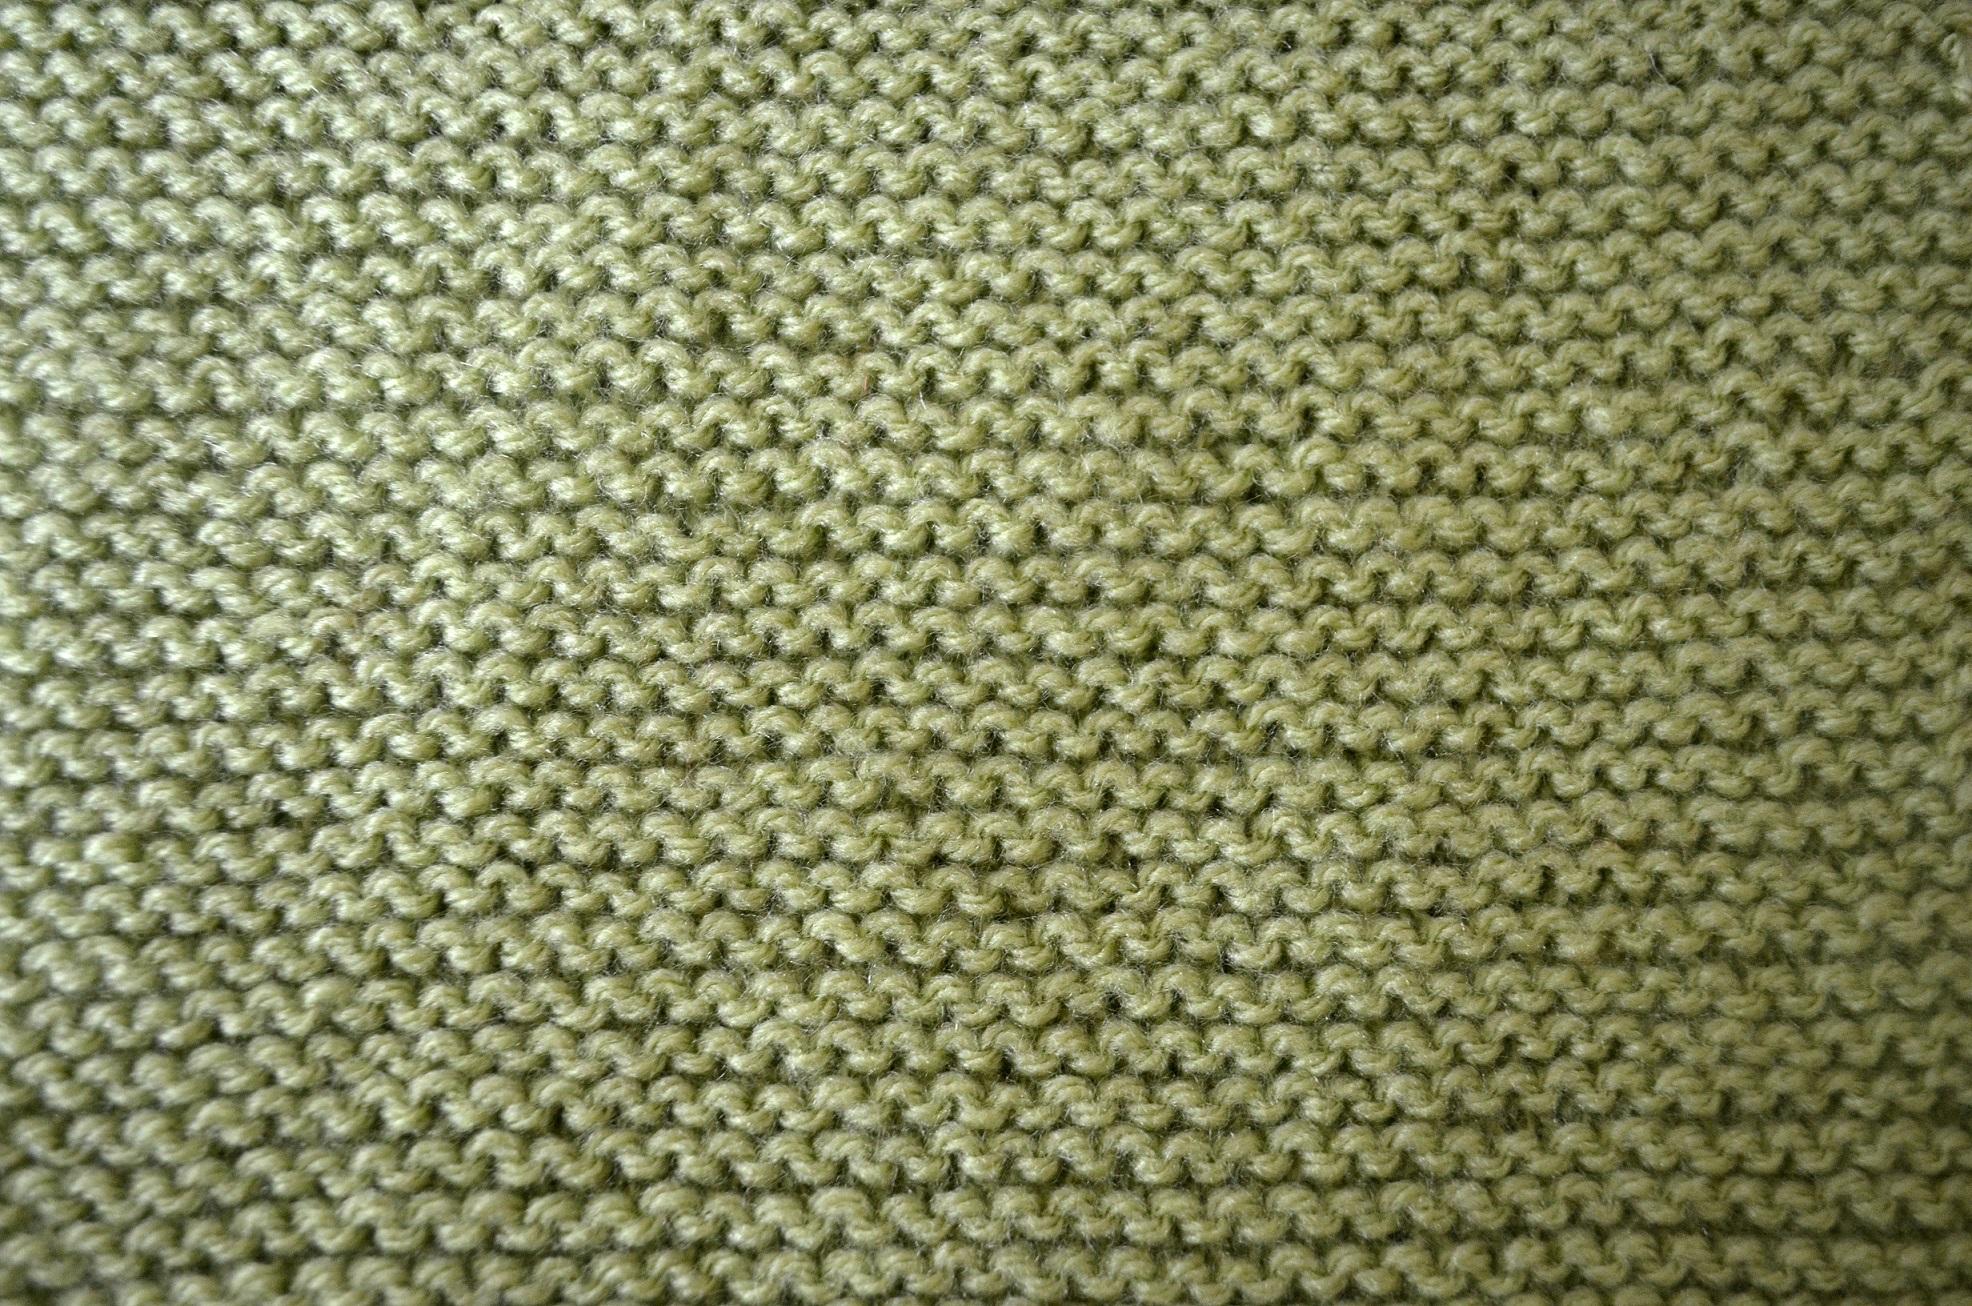 Garter Stitch Patchwork Square - Cottontail Design